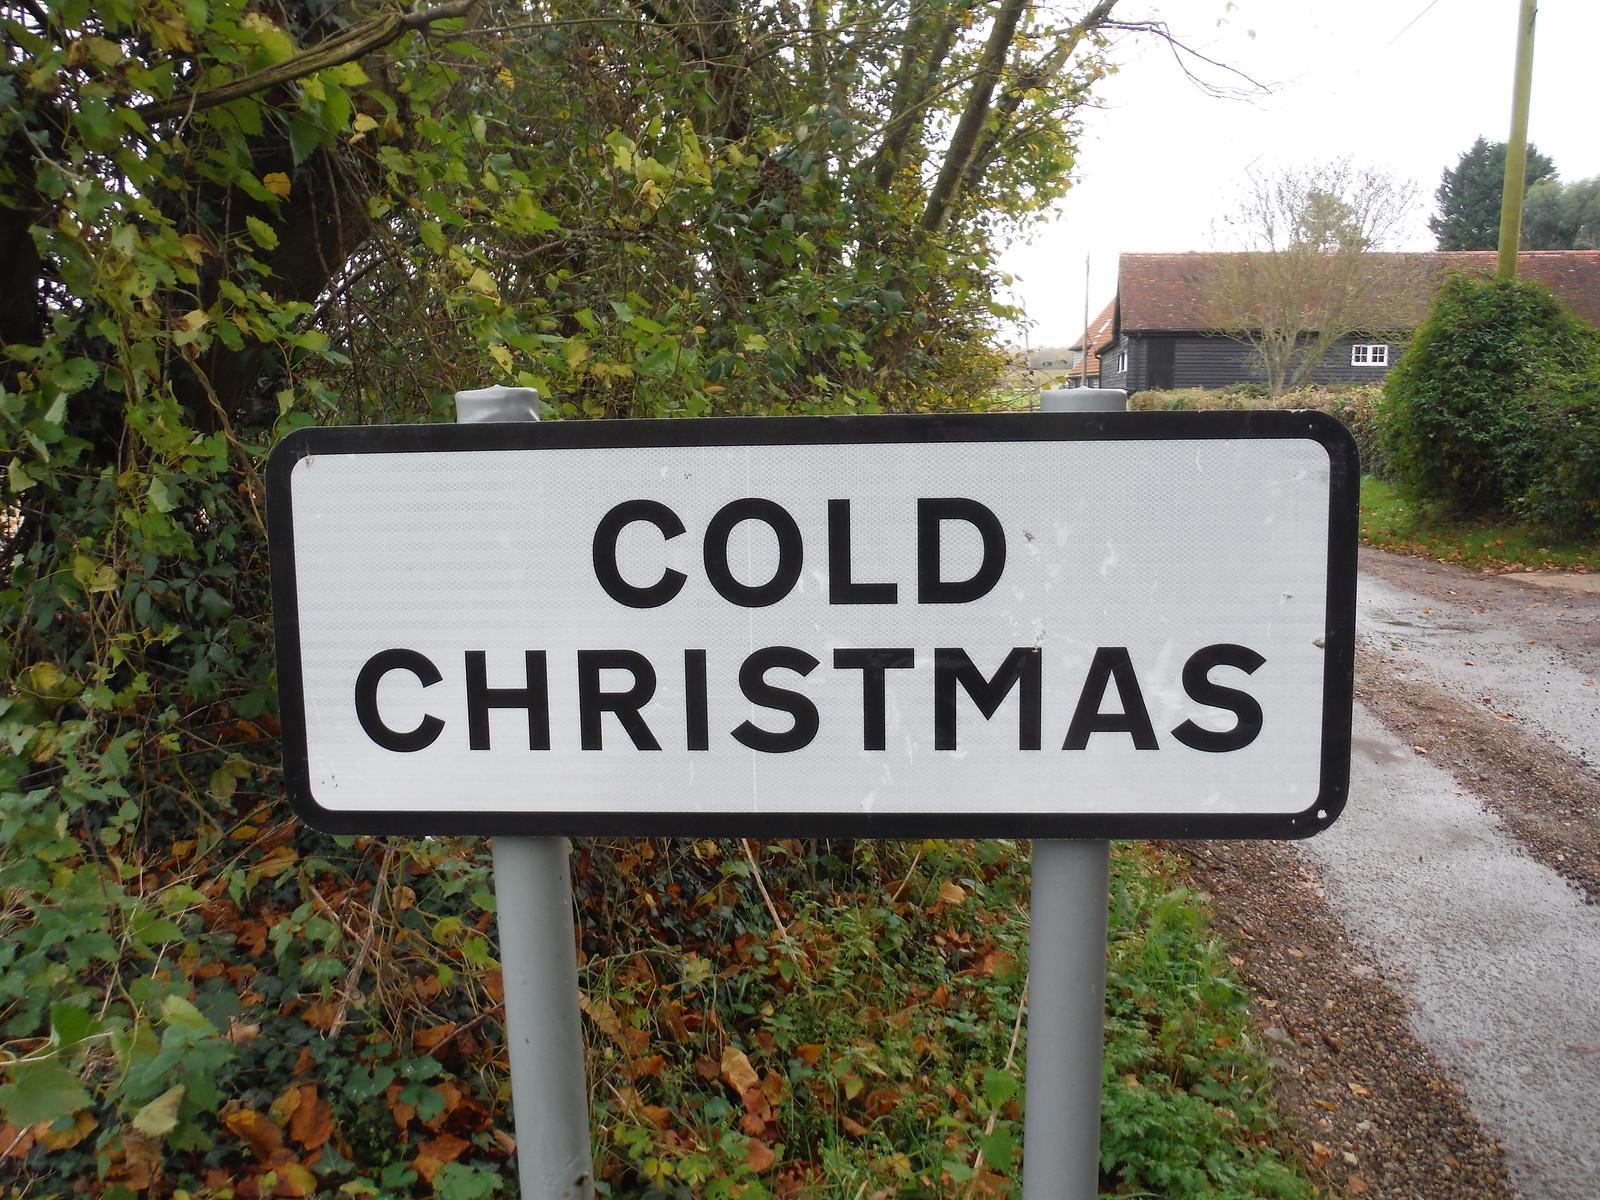 Cold Christmas SWC Walk 165 - St. Margarets Circular